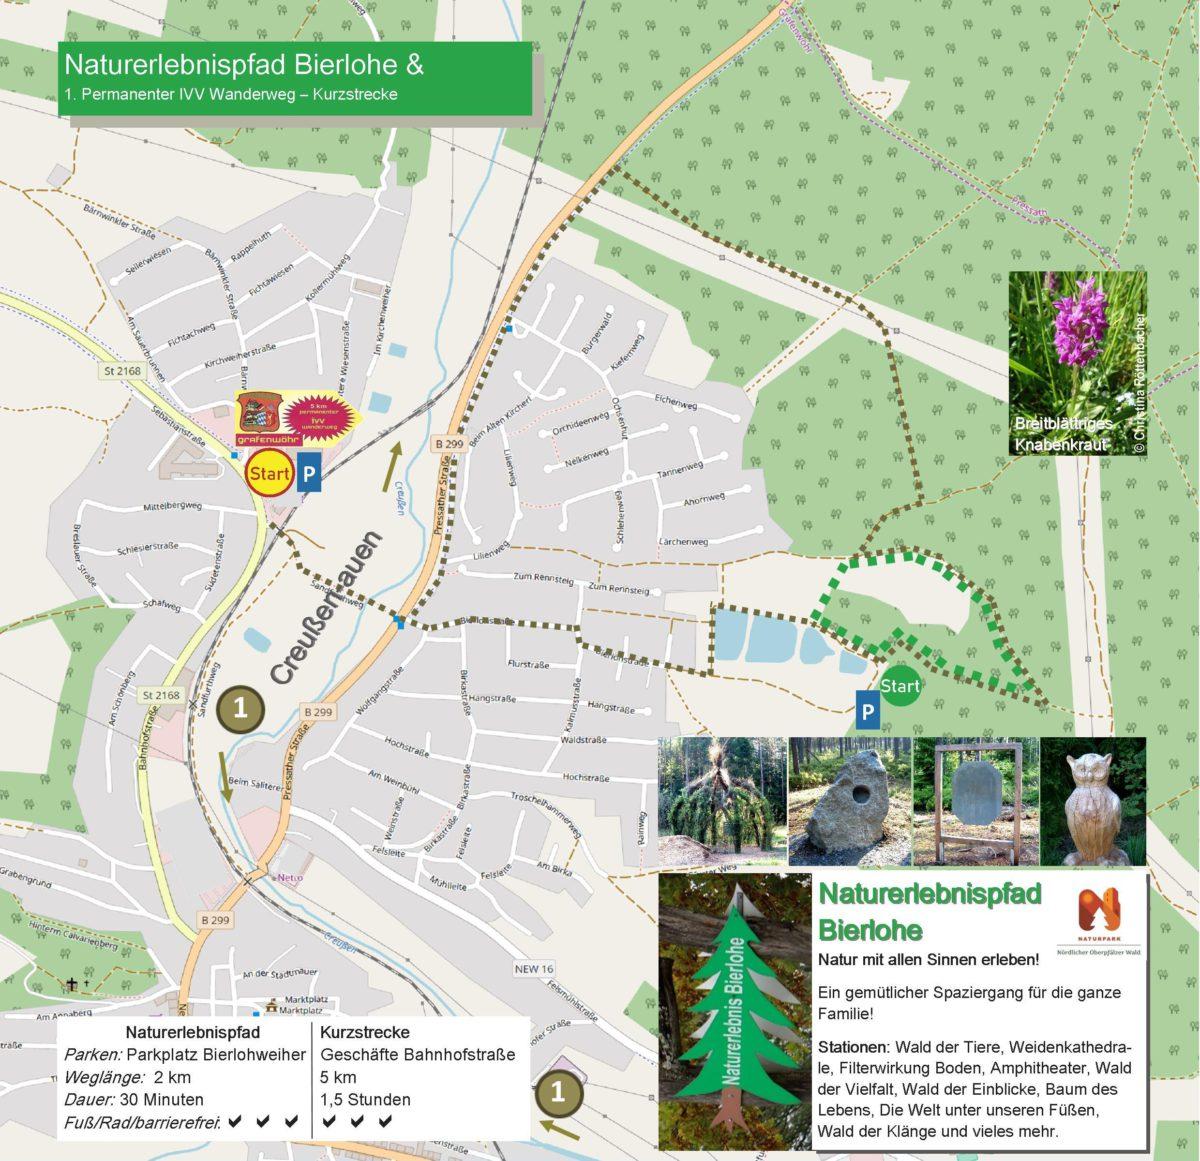 Streckenkarte Naturerlebnispfad Bierlohe